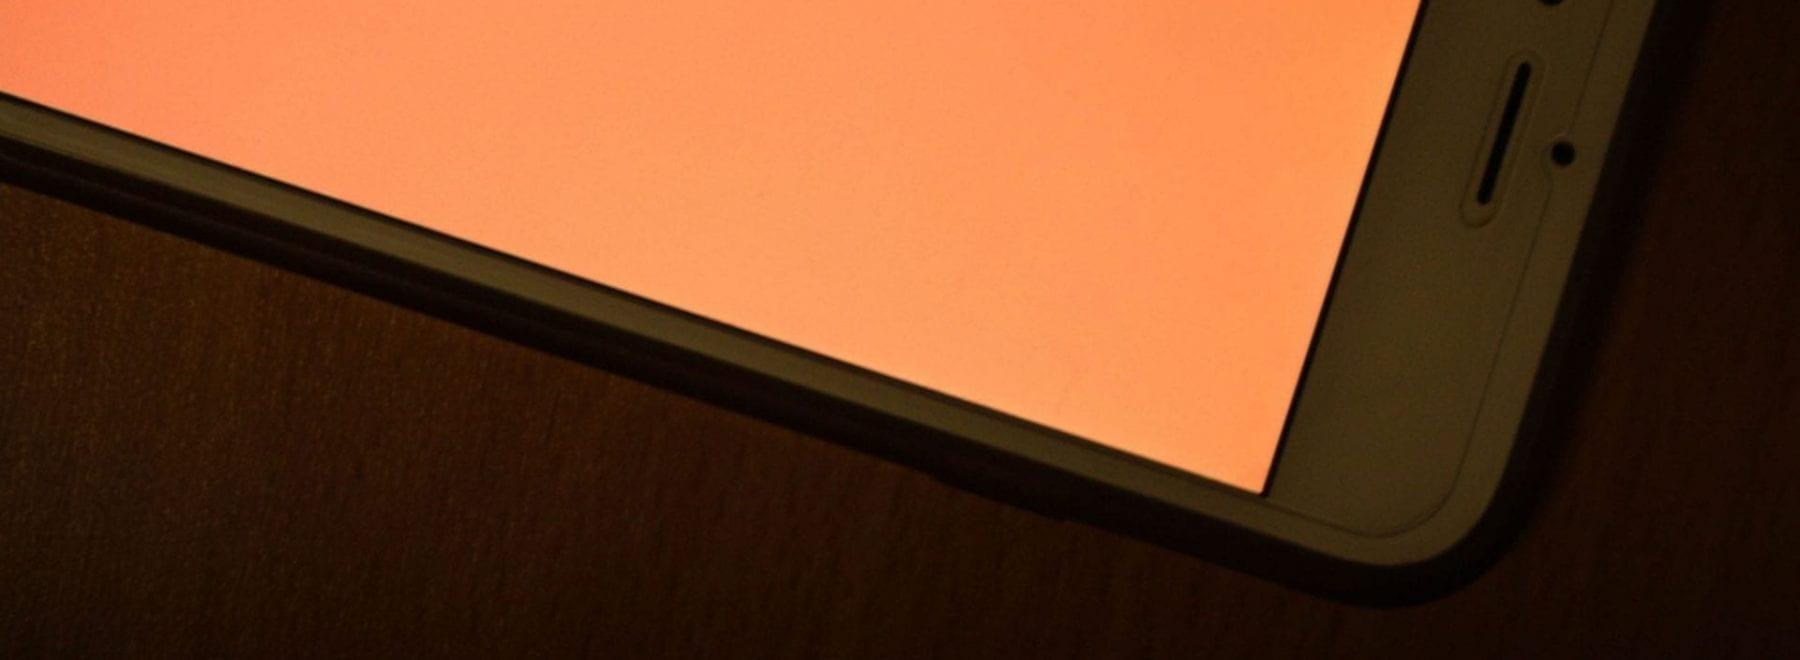 iPhone with an orange screen